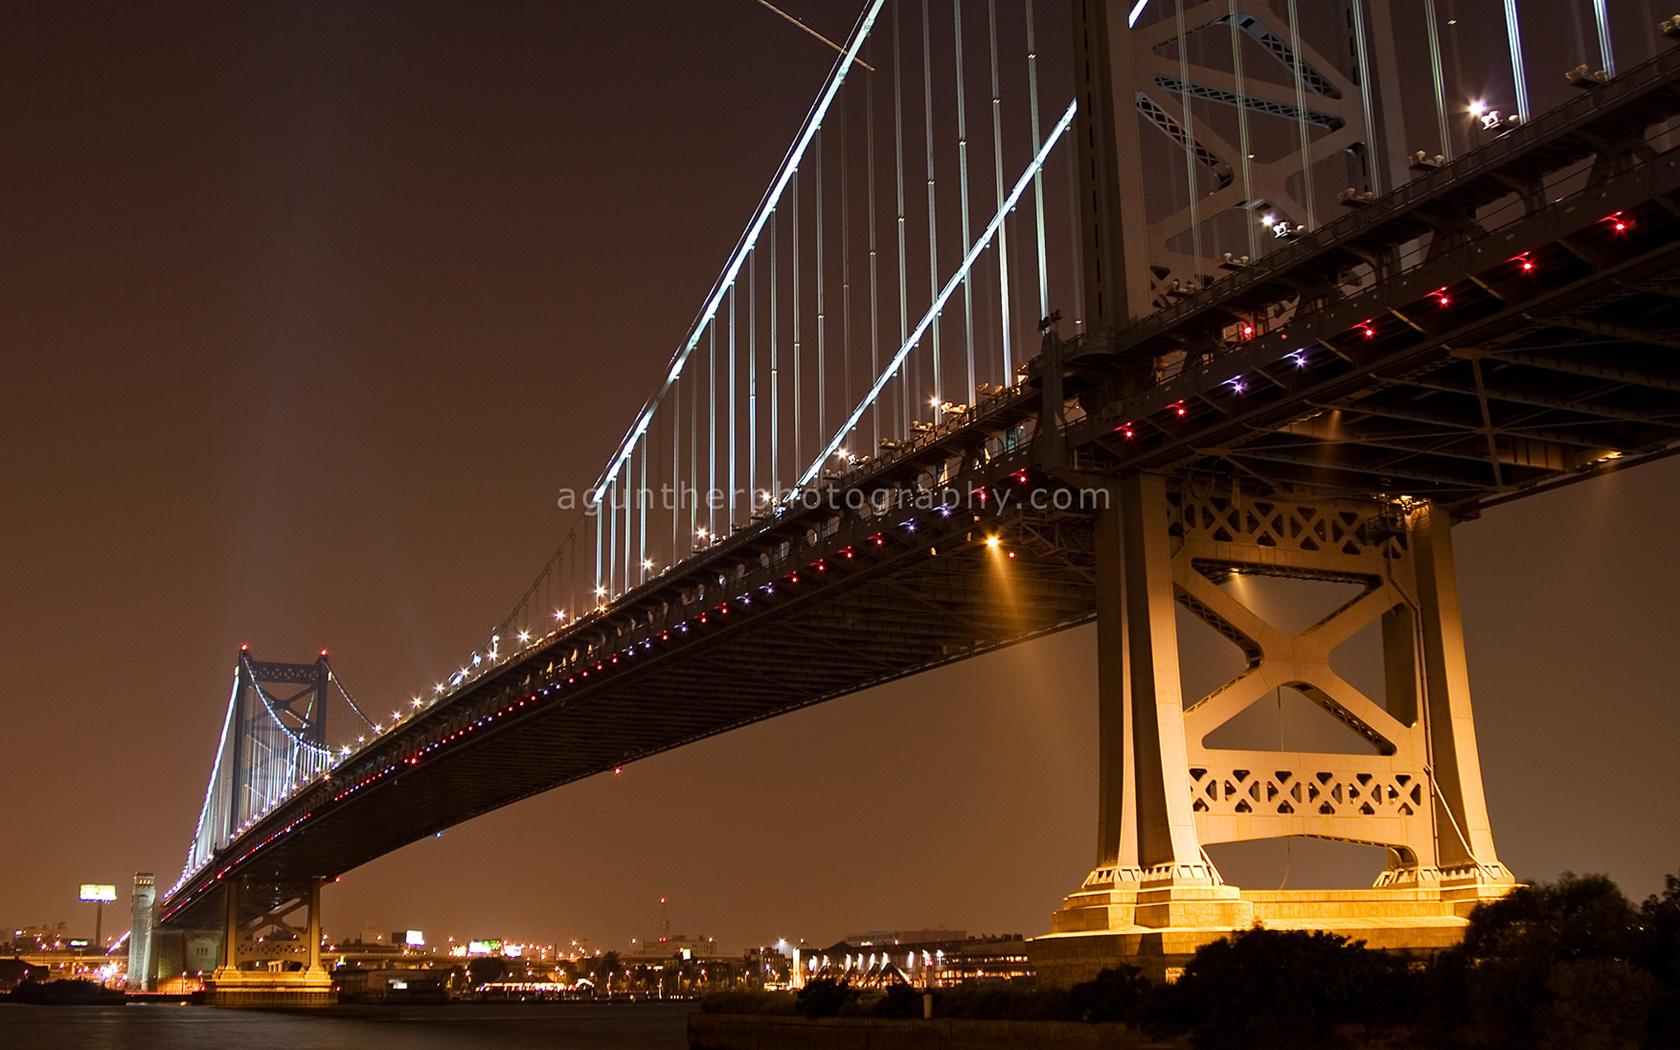 high hd wallpaper,bridge,night,fixed link,landmark,cable stayed bridge